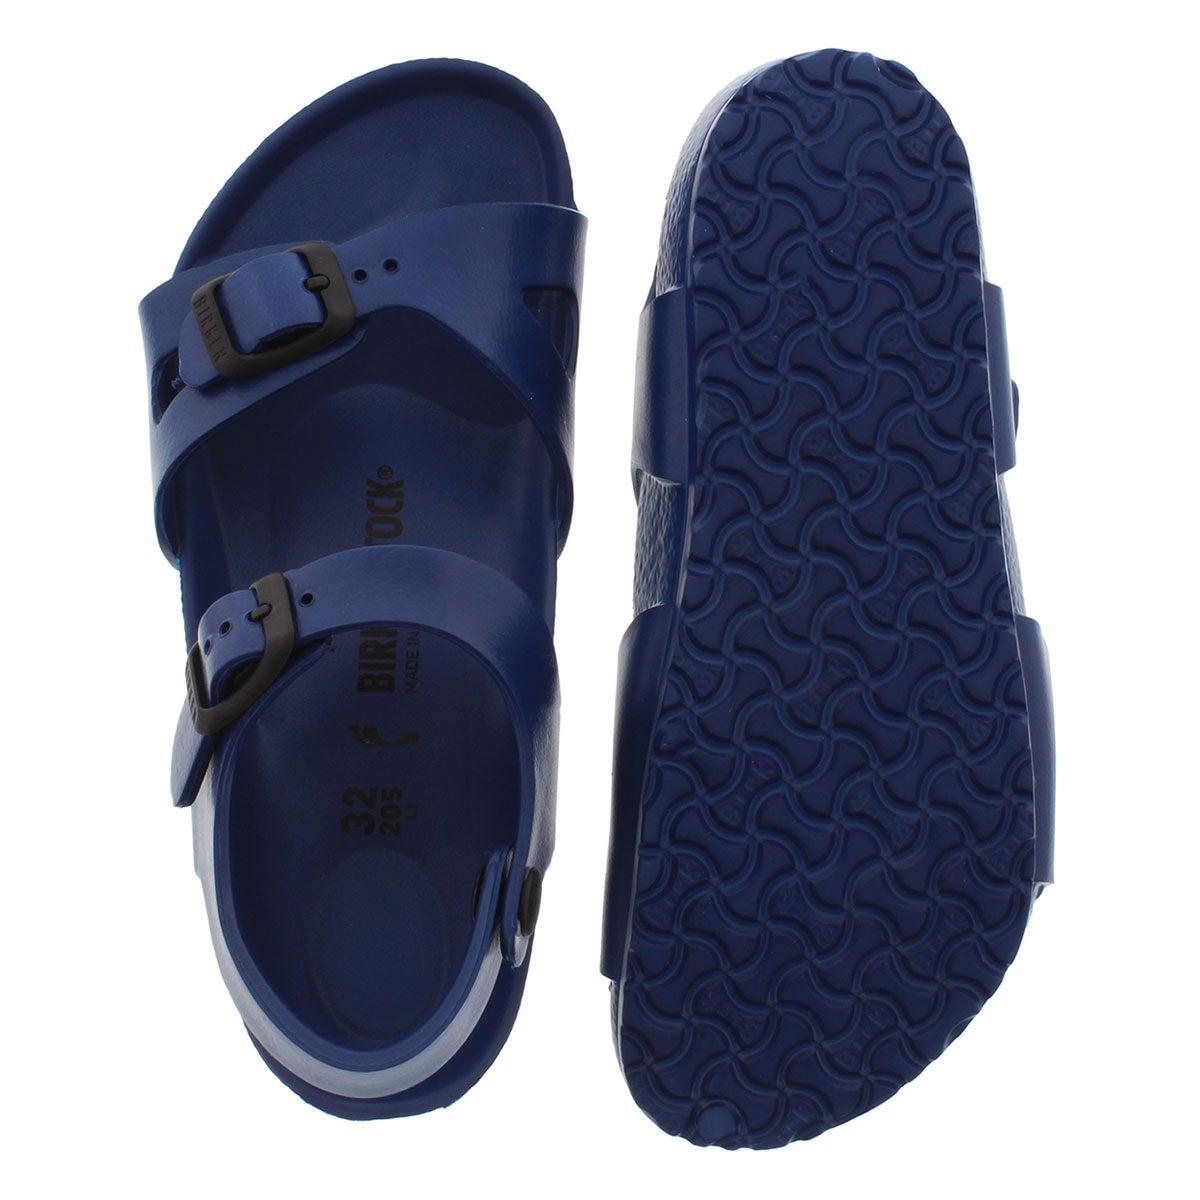 Kds Rio navy 2 strap sandal - Narrow